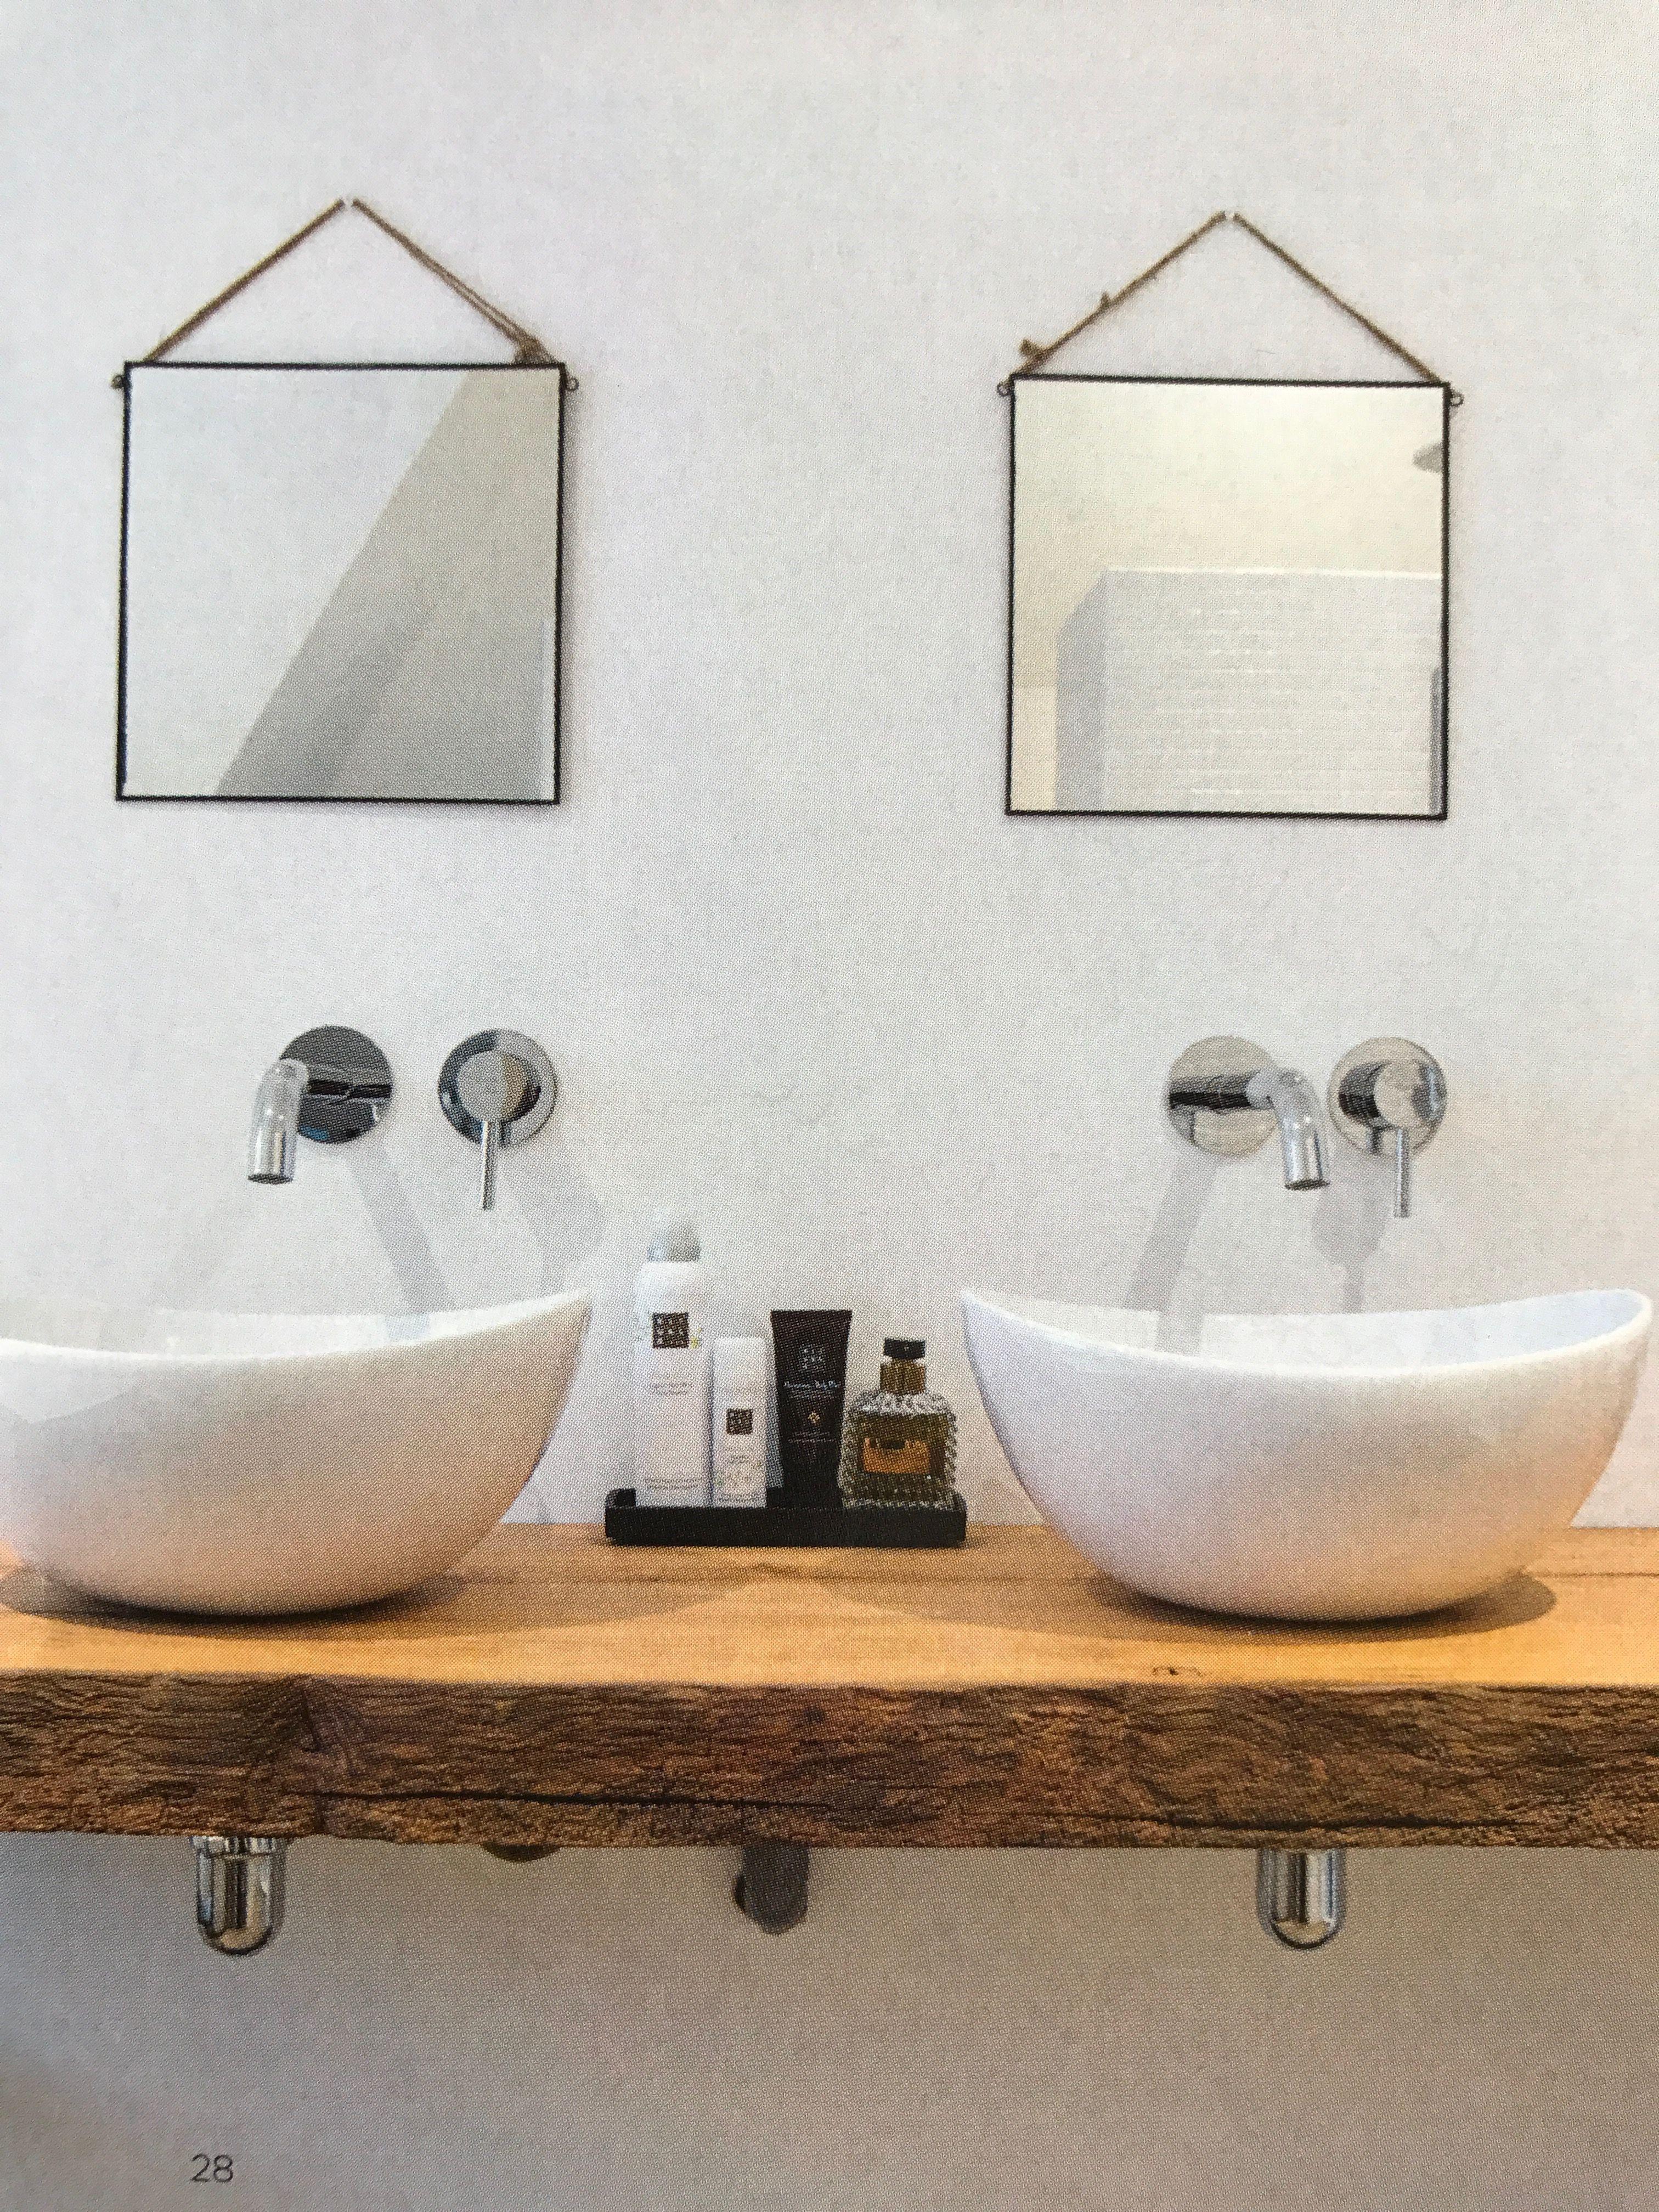 Badkamer Ideeen Hout : Badkamer ideeen inloopdouche huis decor